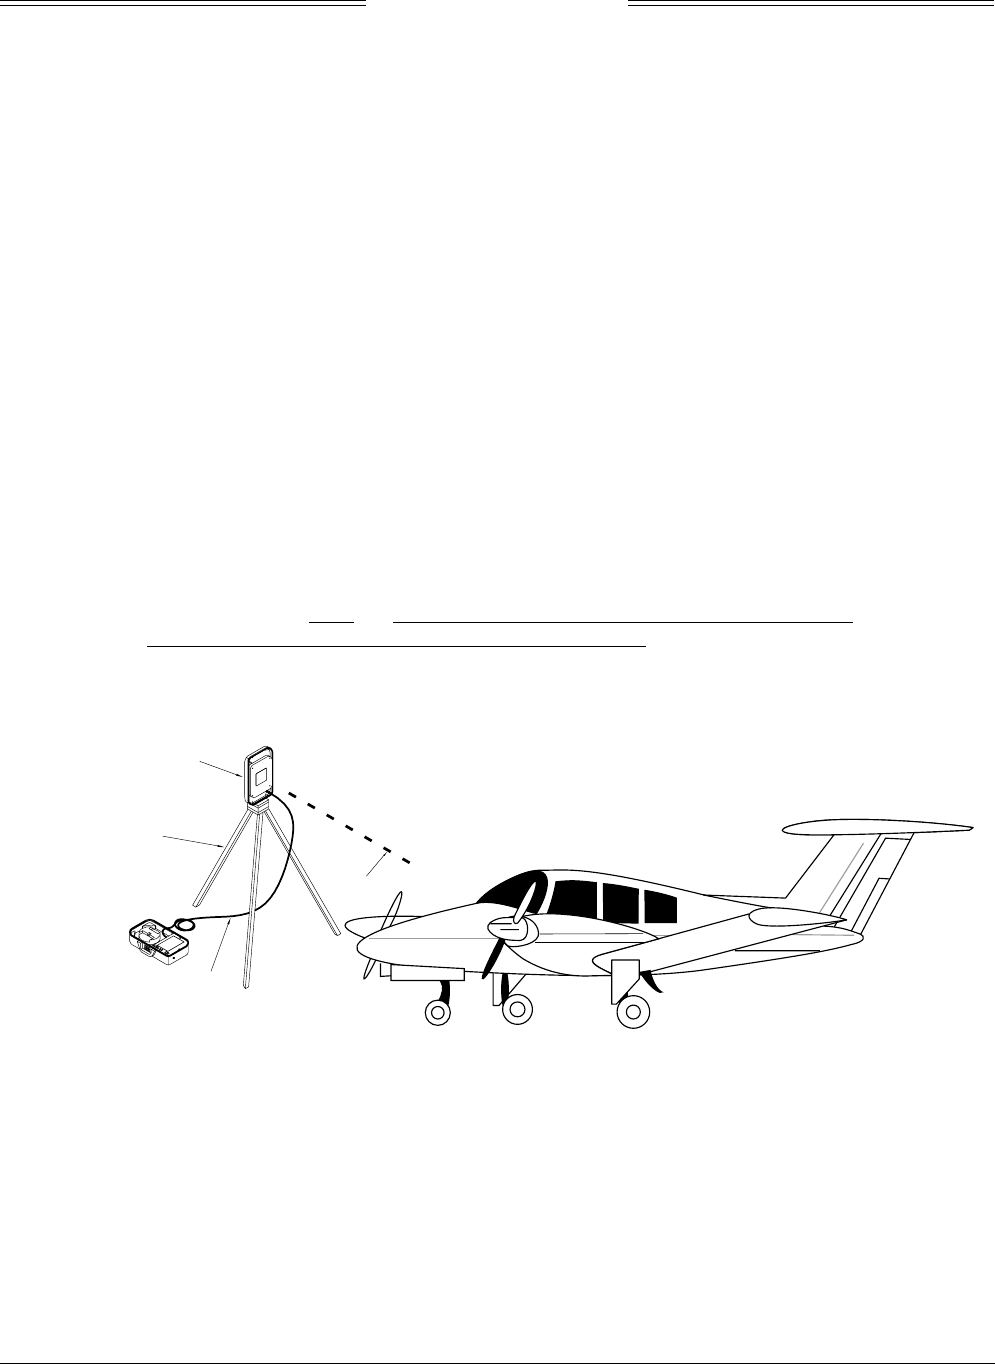 L 3 Communications Avionics Systems TRC899 User Manual